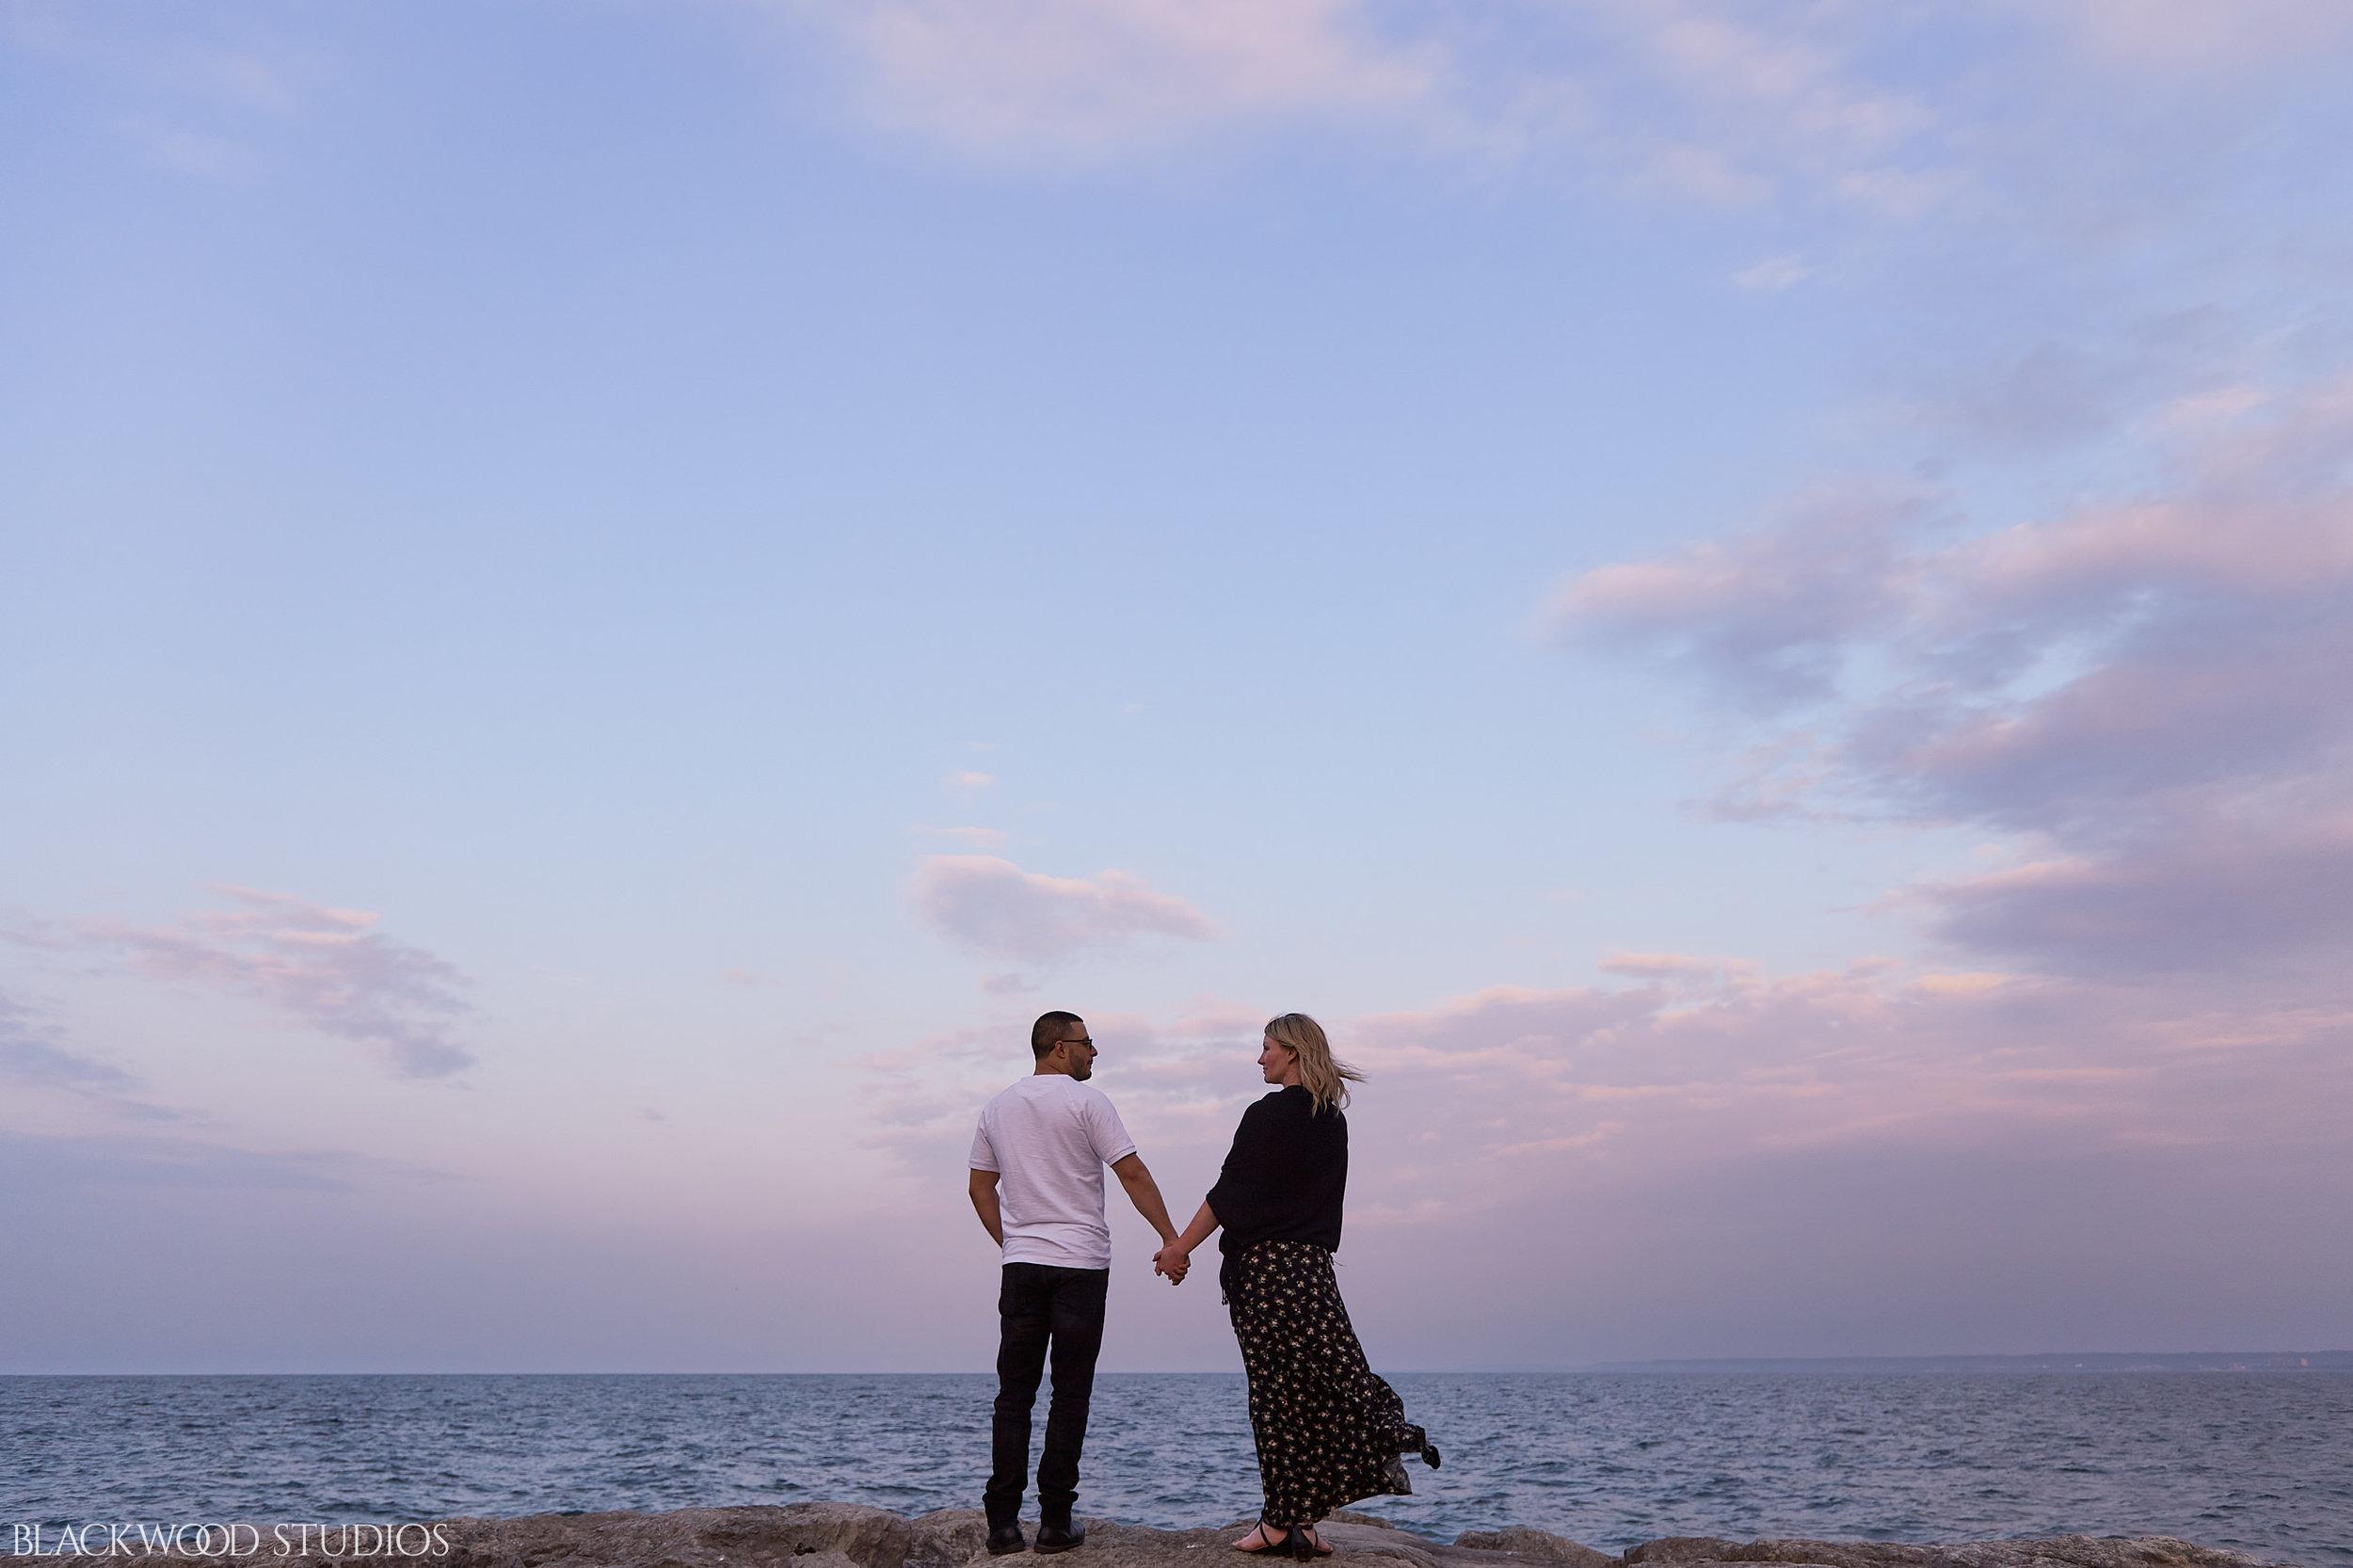 Blackwood-Studios-Photography-20190604202609-Shannon-and-Pedro-Engagement-Spencer-Smith-Park-Burlington-Ontario-Canada.jpg